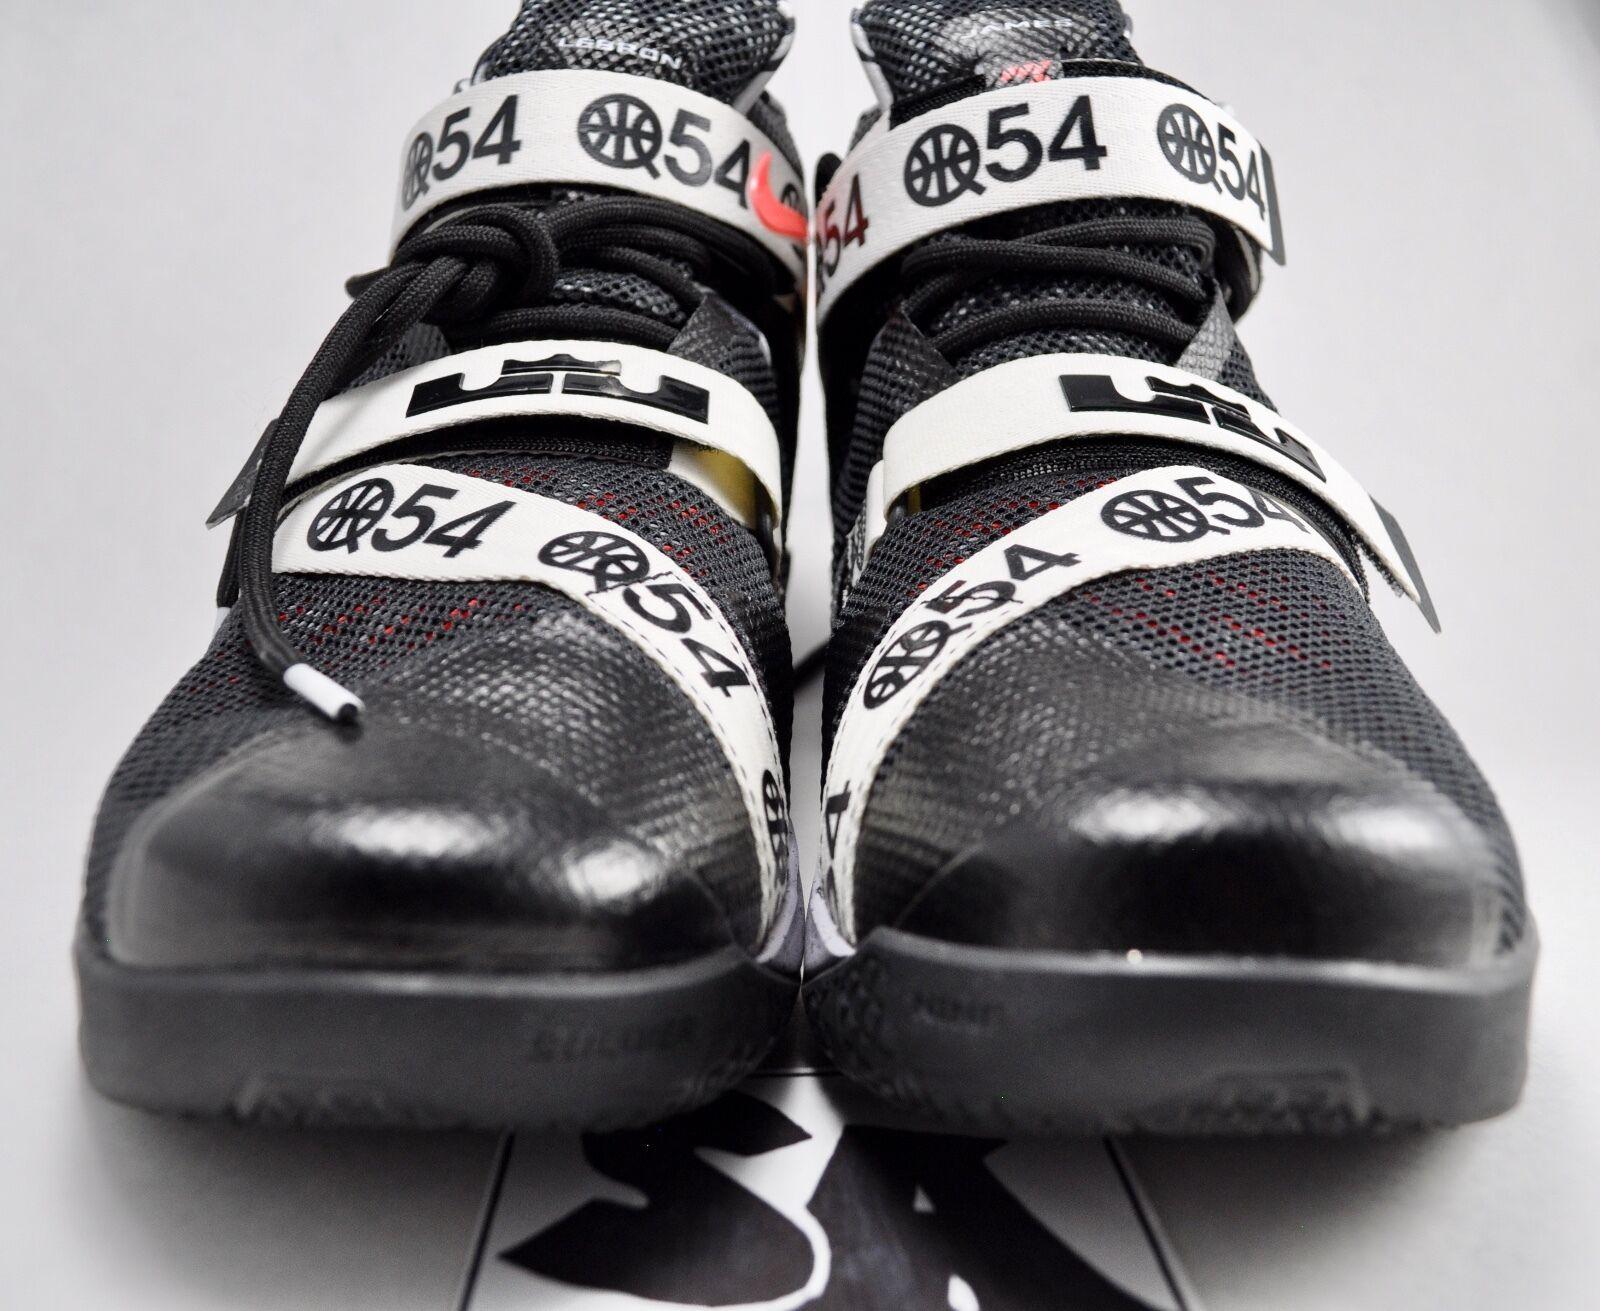 Quai54 Nike Lebron Soldier IX LMTD Q54 810803 015 Size 11